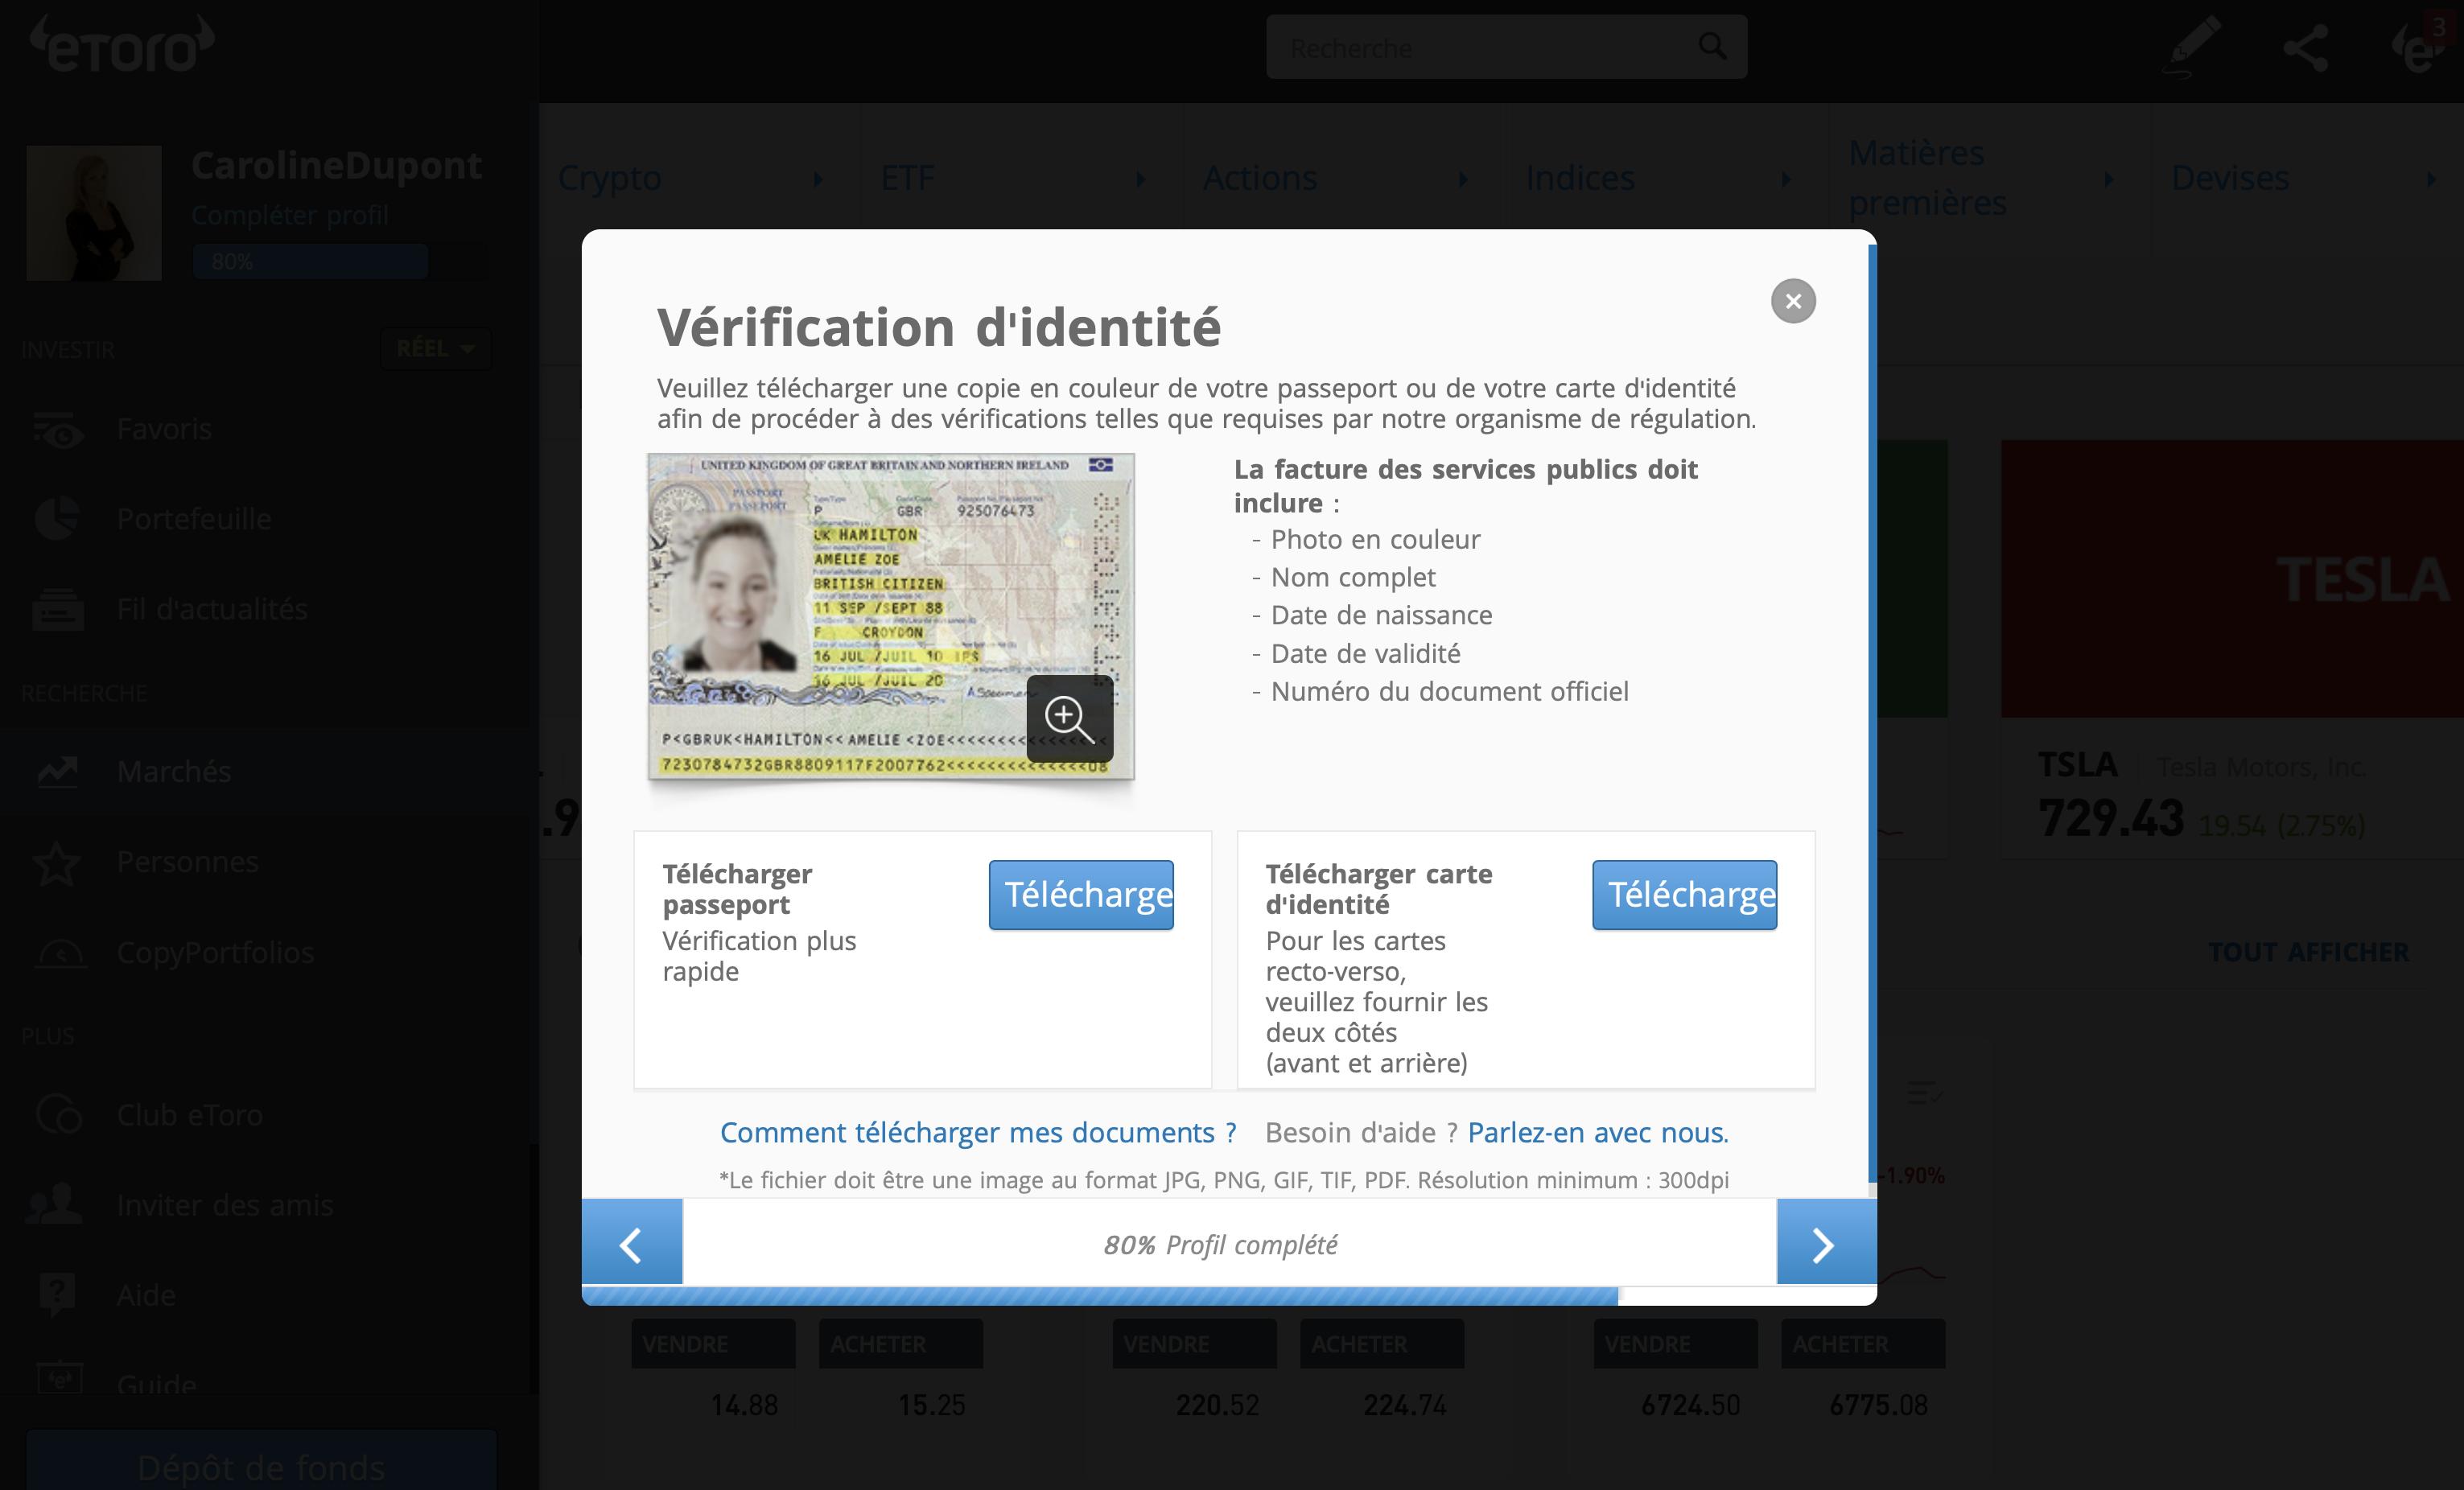 Verification du compte eToro